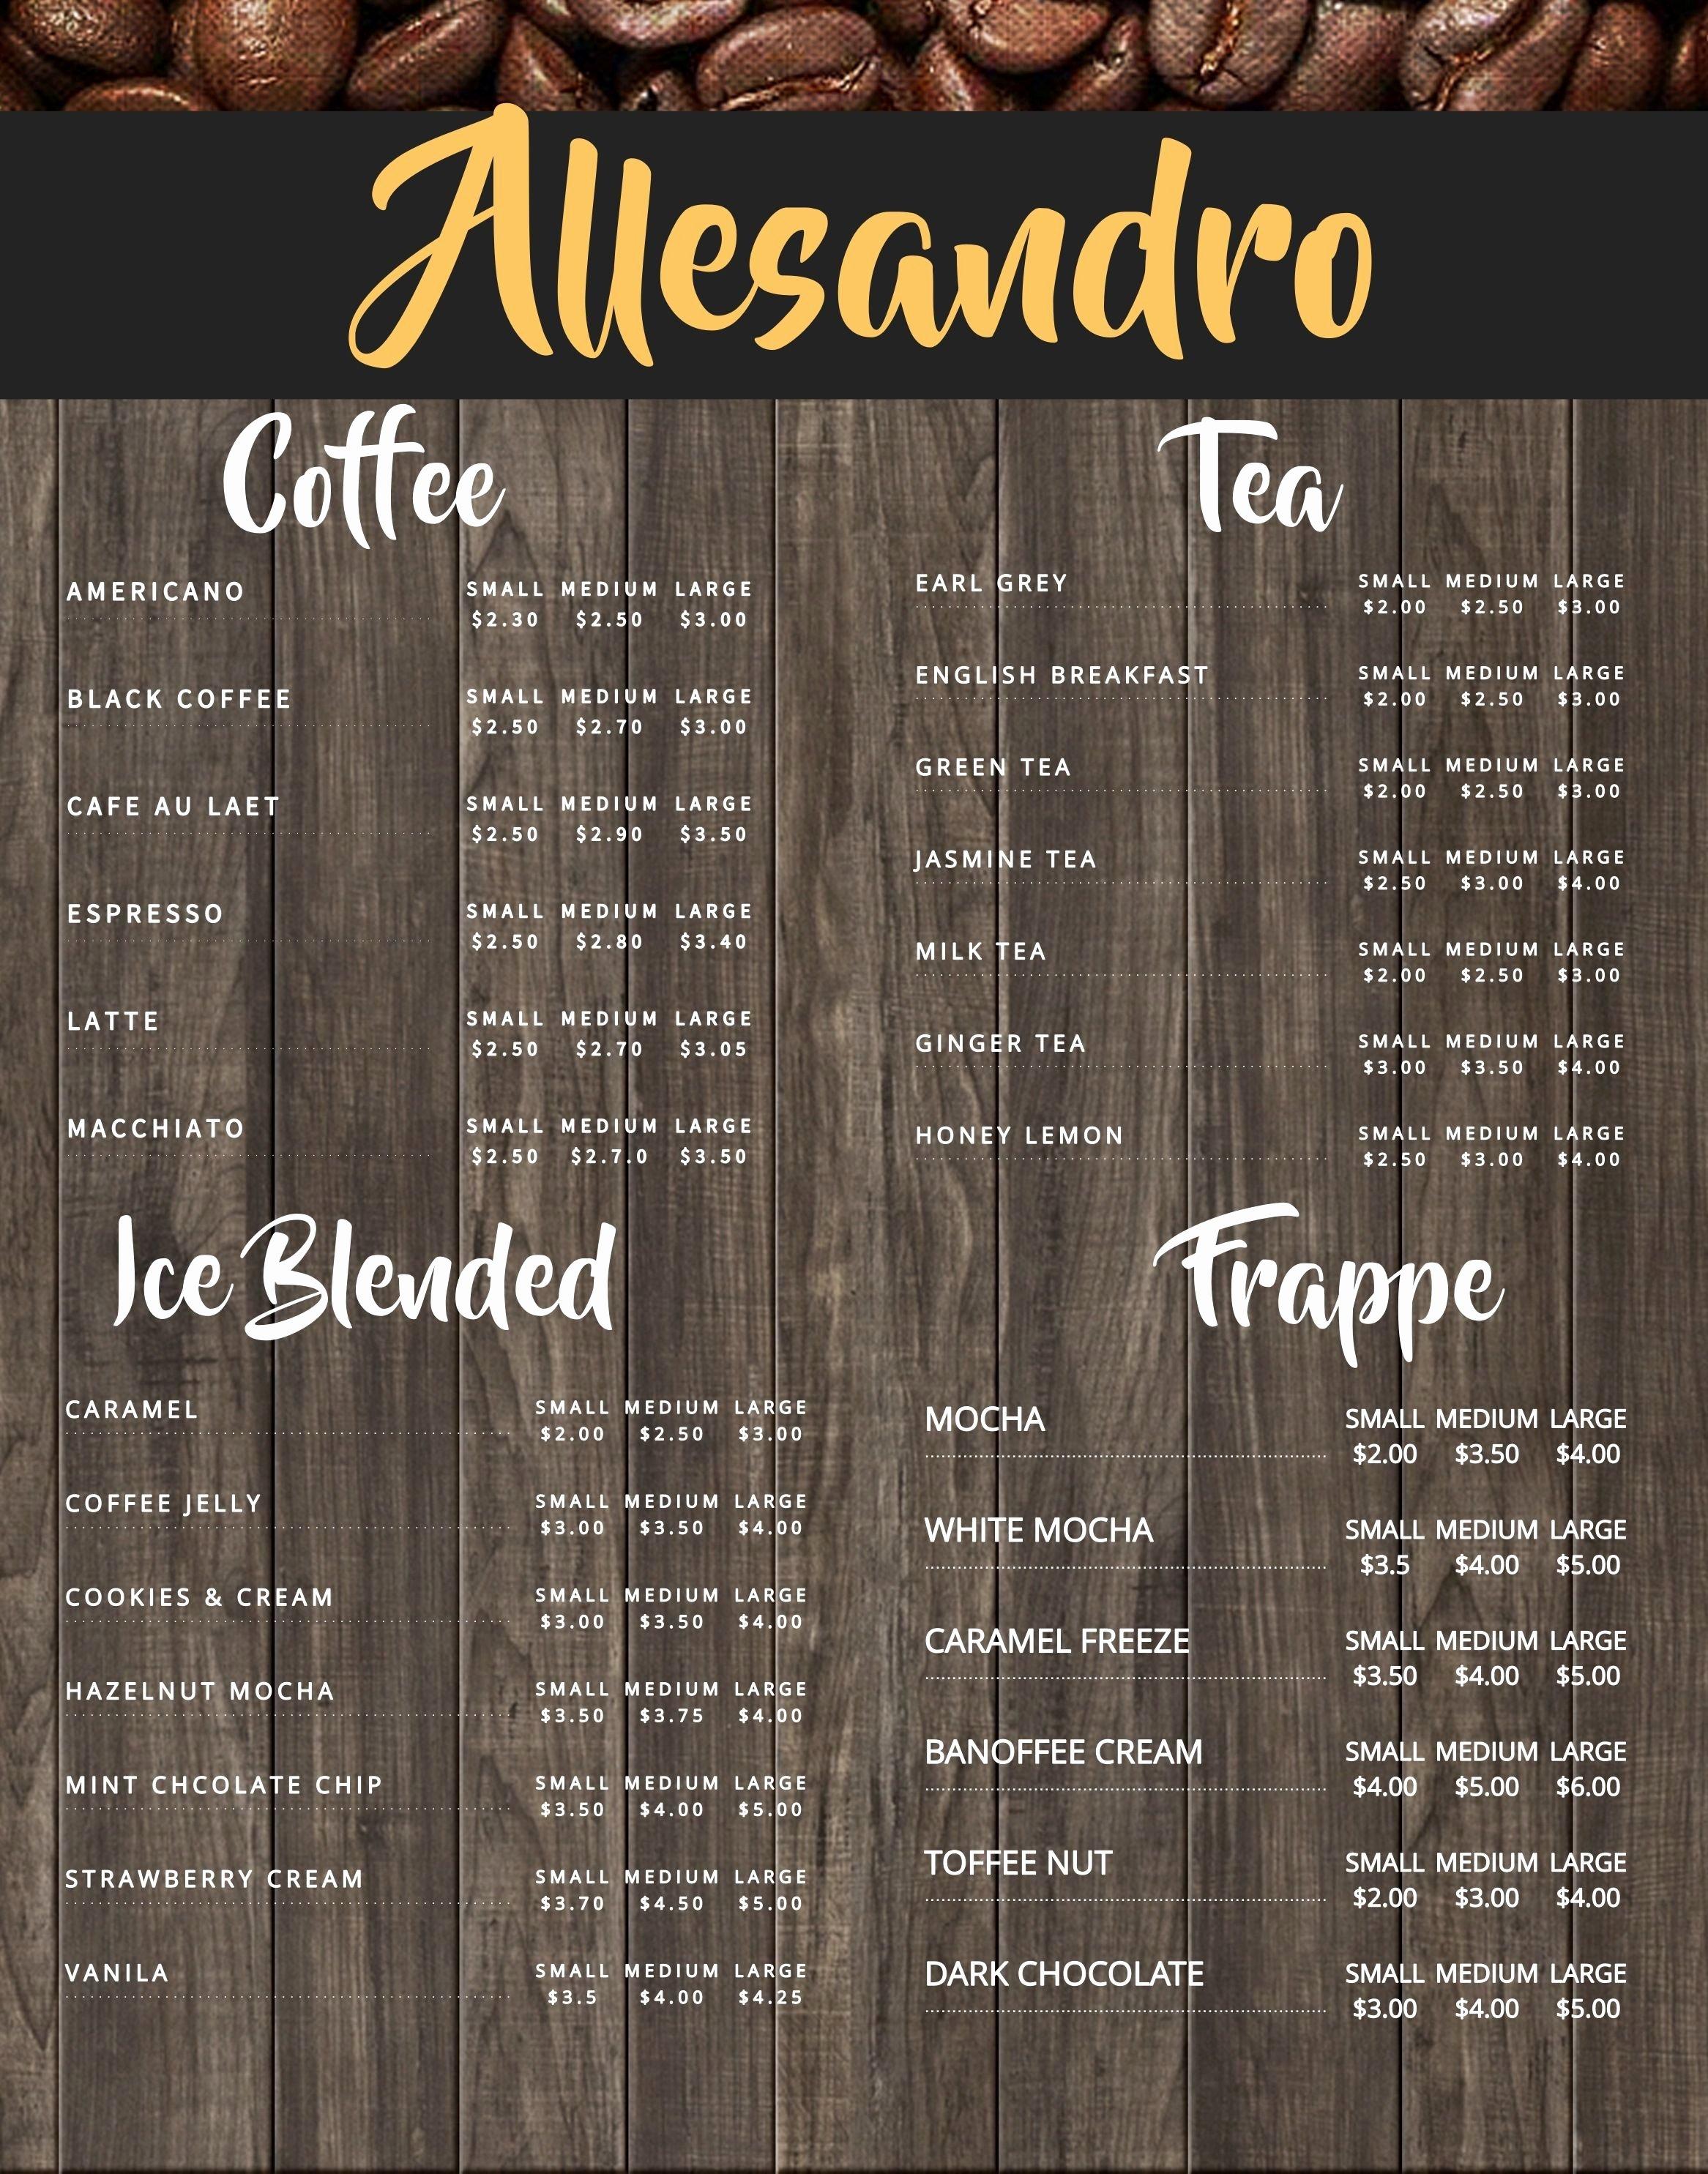 Coffee Shop Menu Template Fresh Coffee Shop Menu Board Design Template to Customize